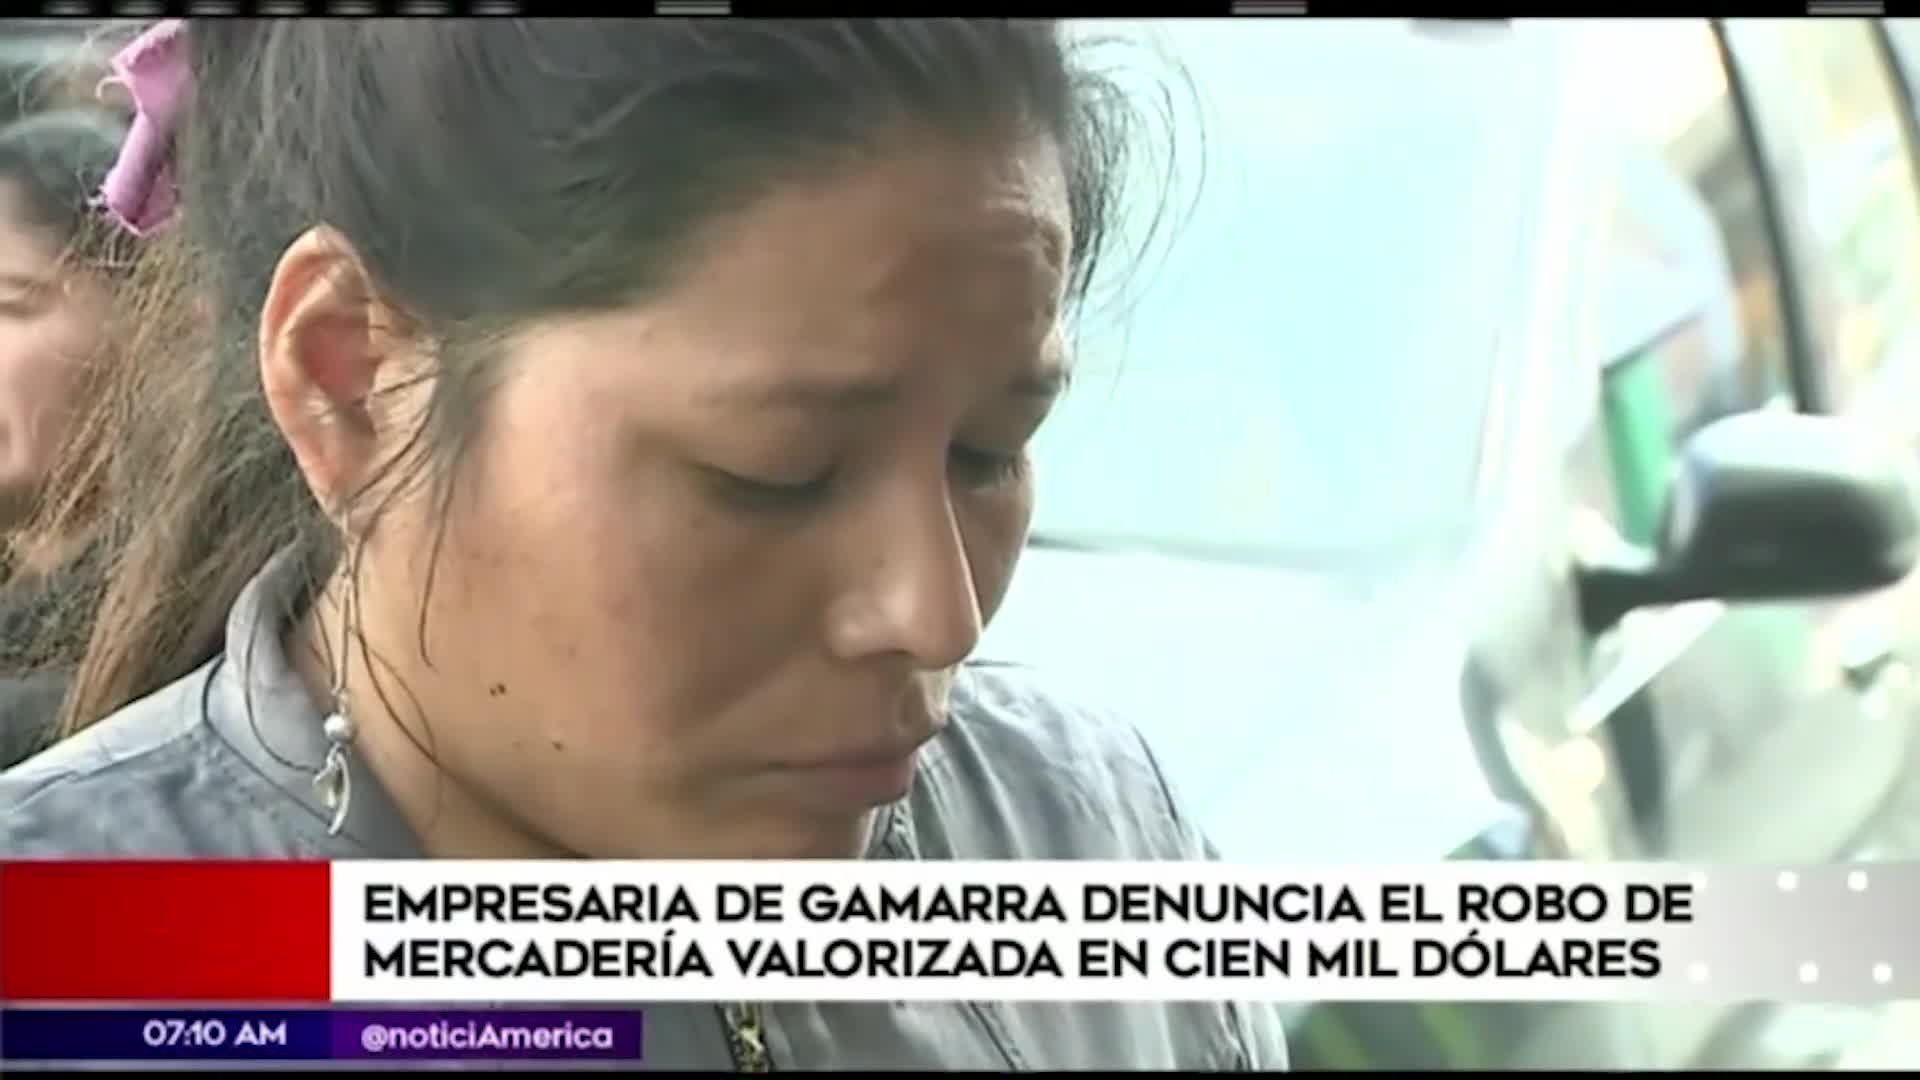 Empresaria de Gamarra denuncia robo de mercadería